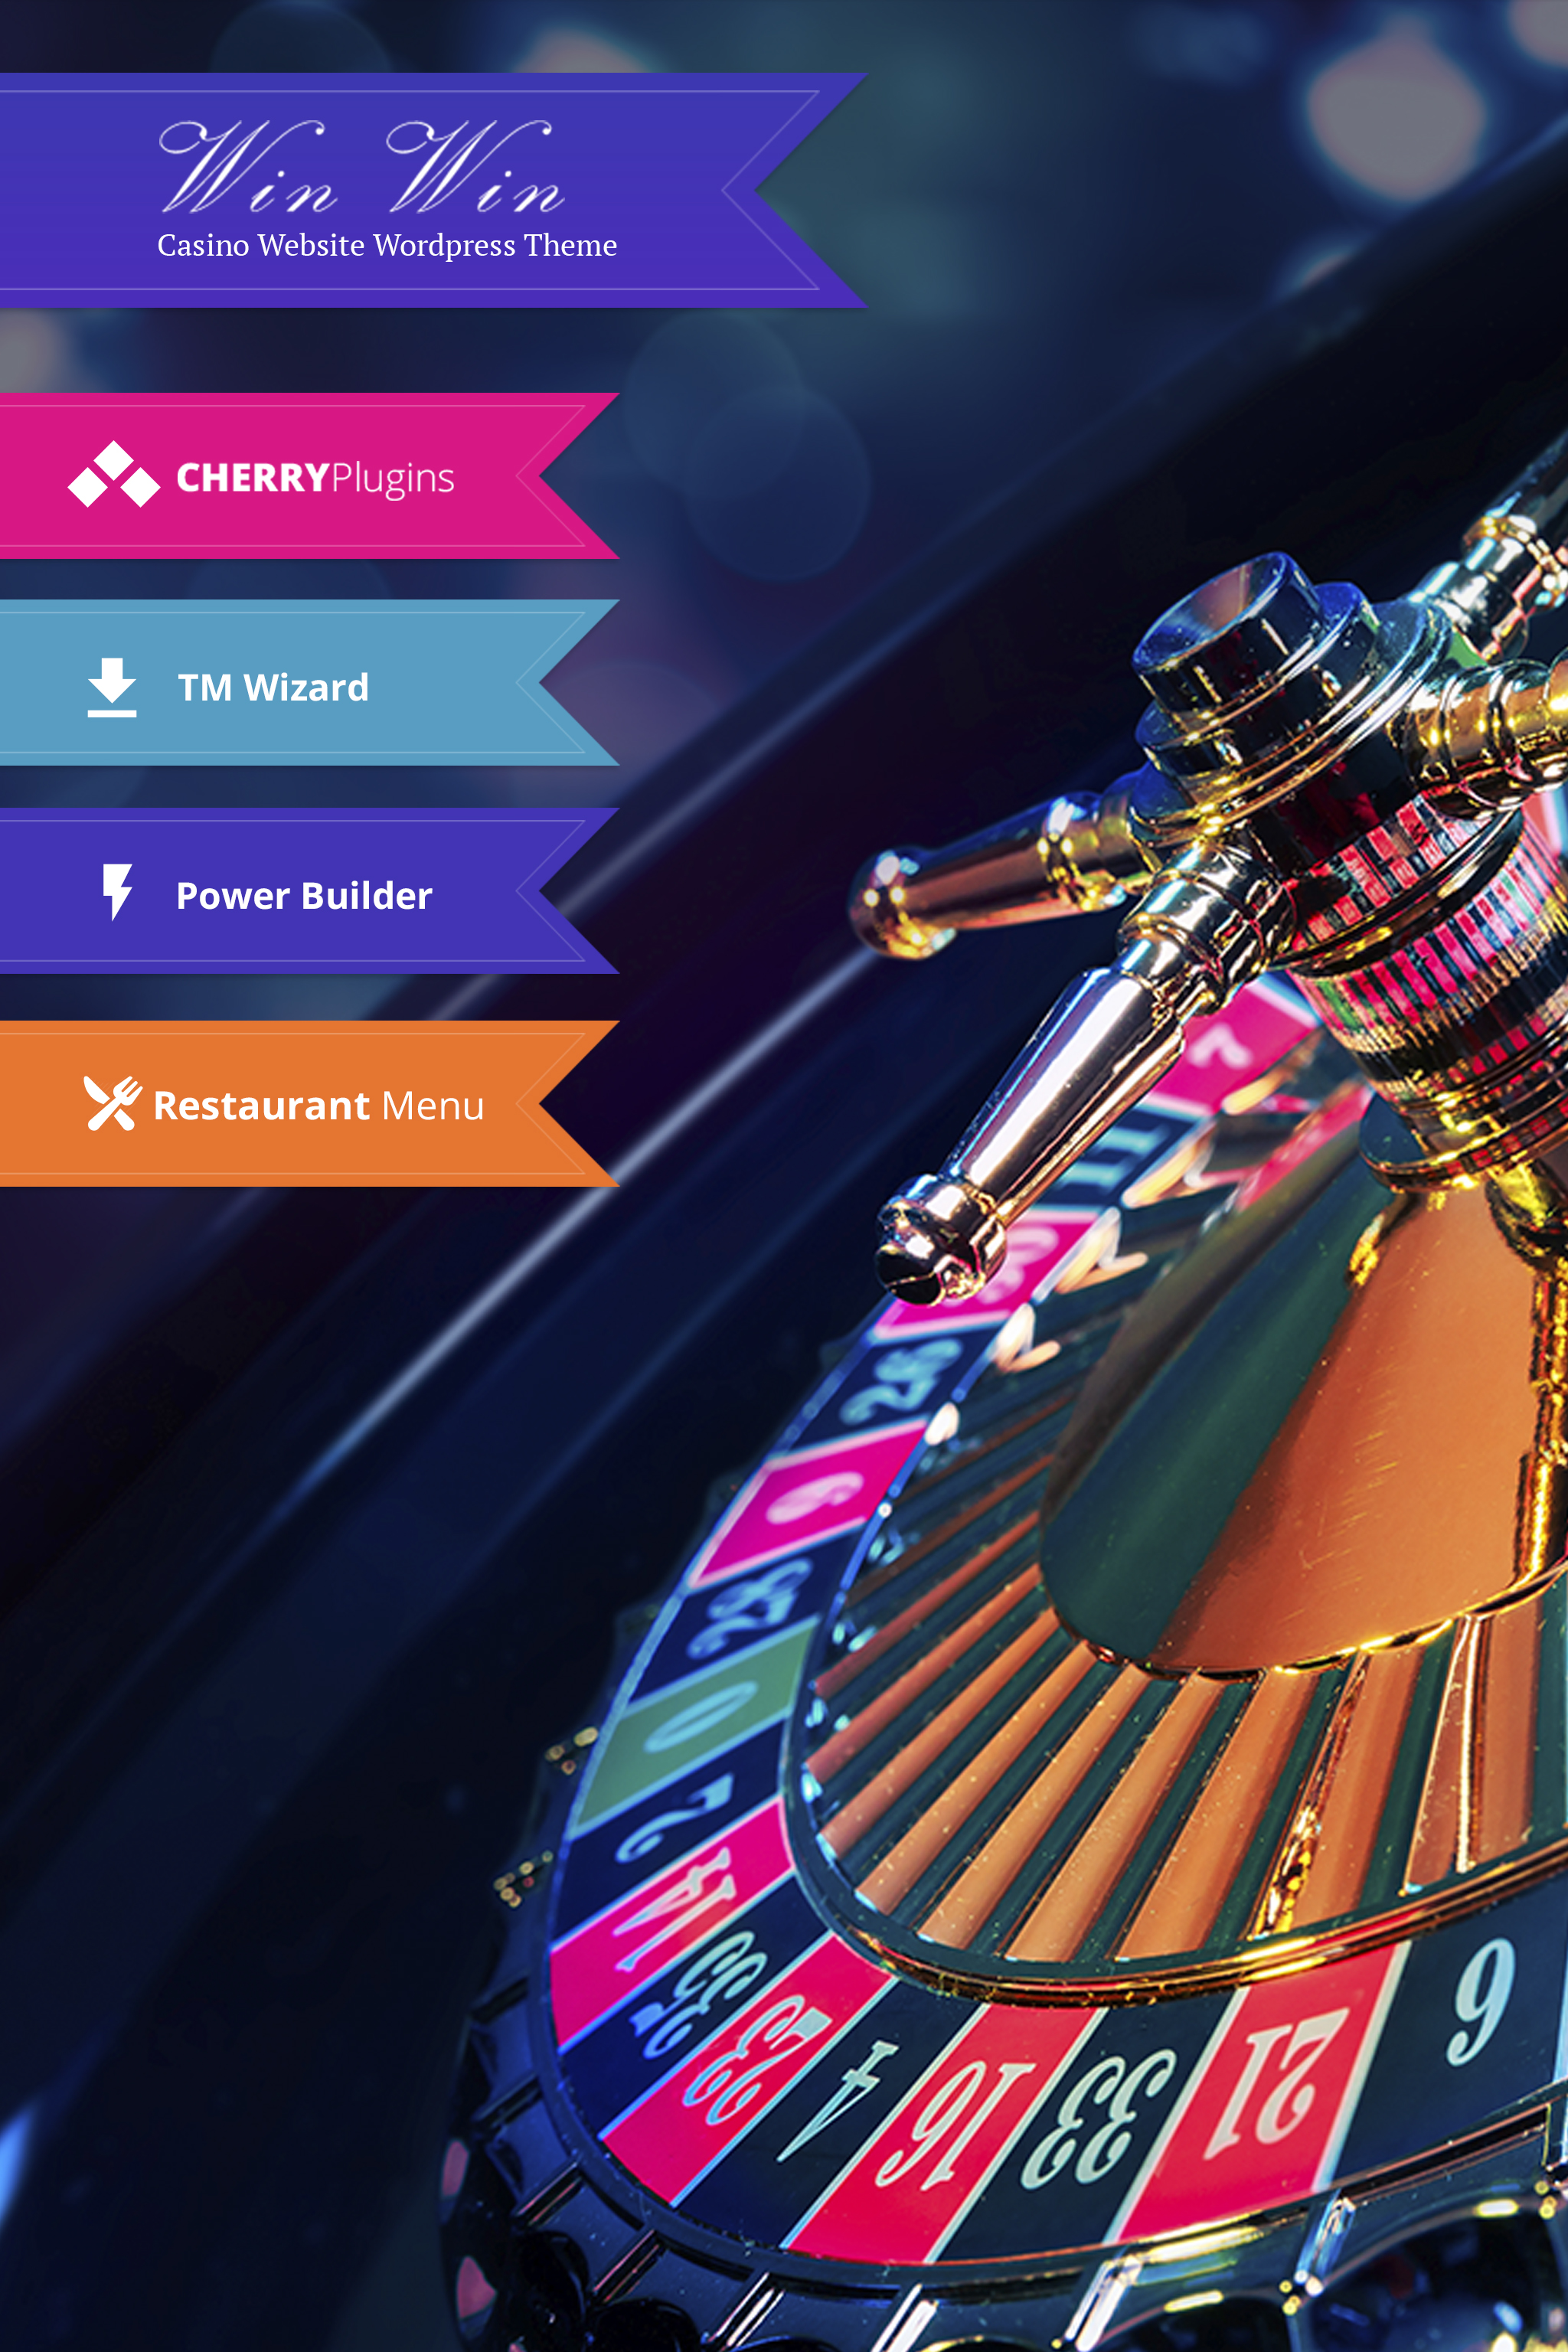 Responsive WinWin - Casino Website WordPress Theme #64702 - Ekran resmi